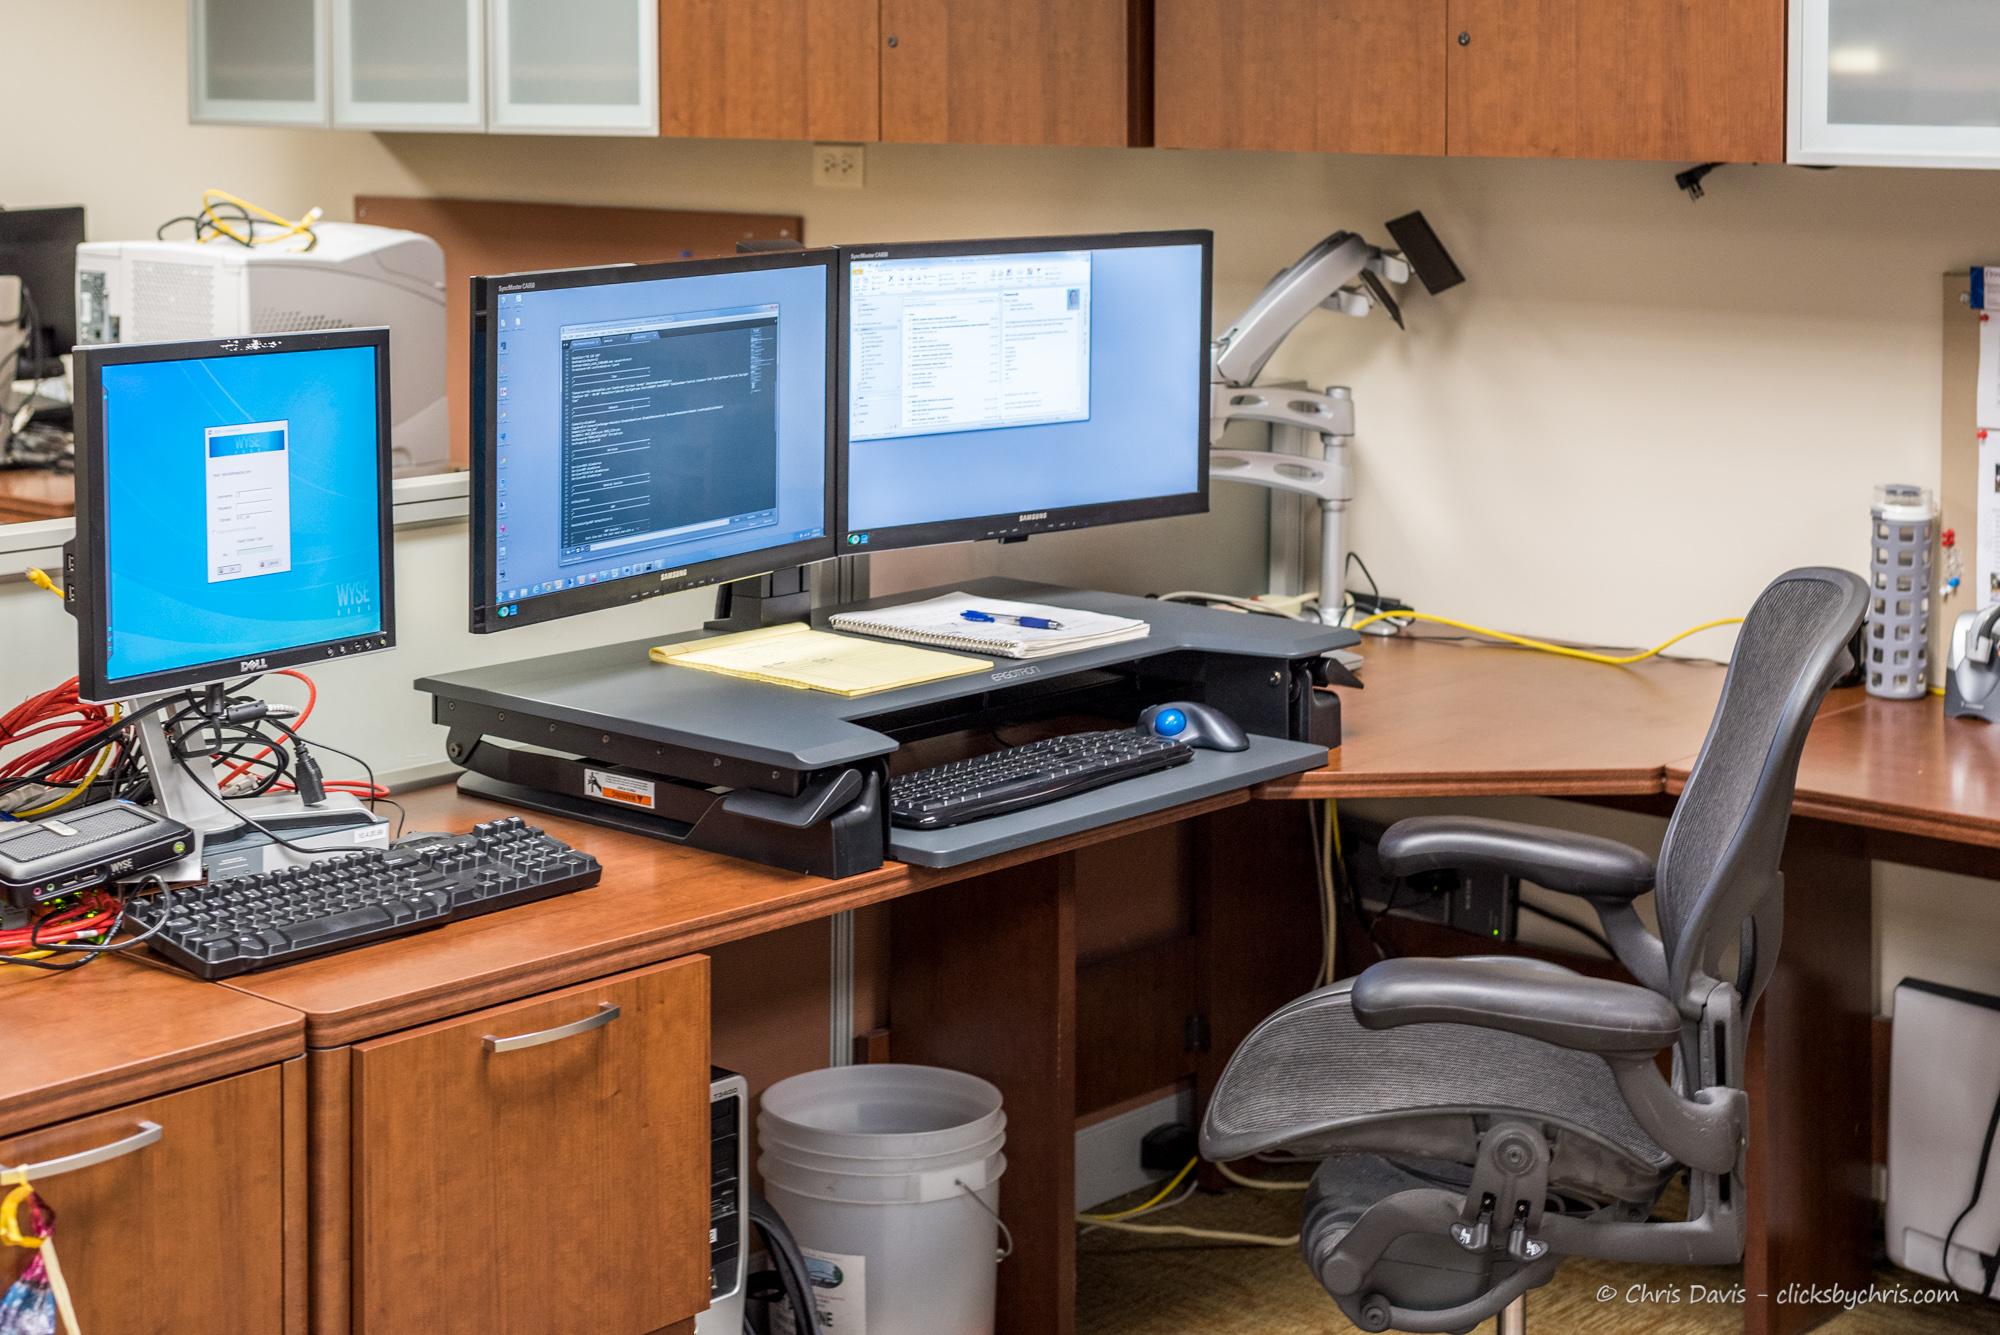 Tabletop Standing Desk By Ergotron